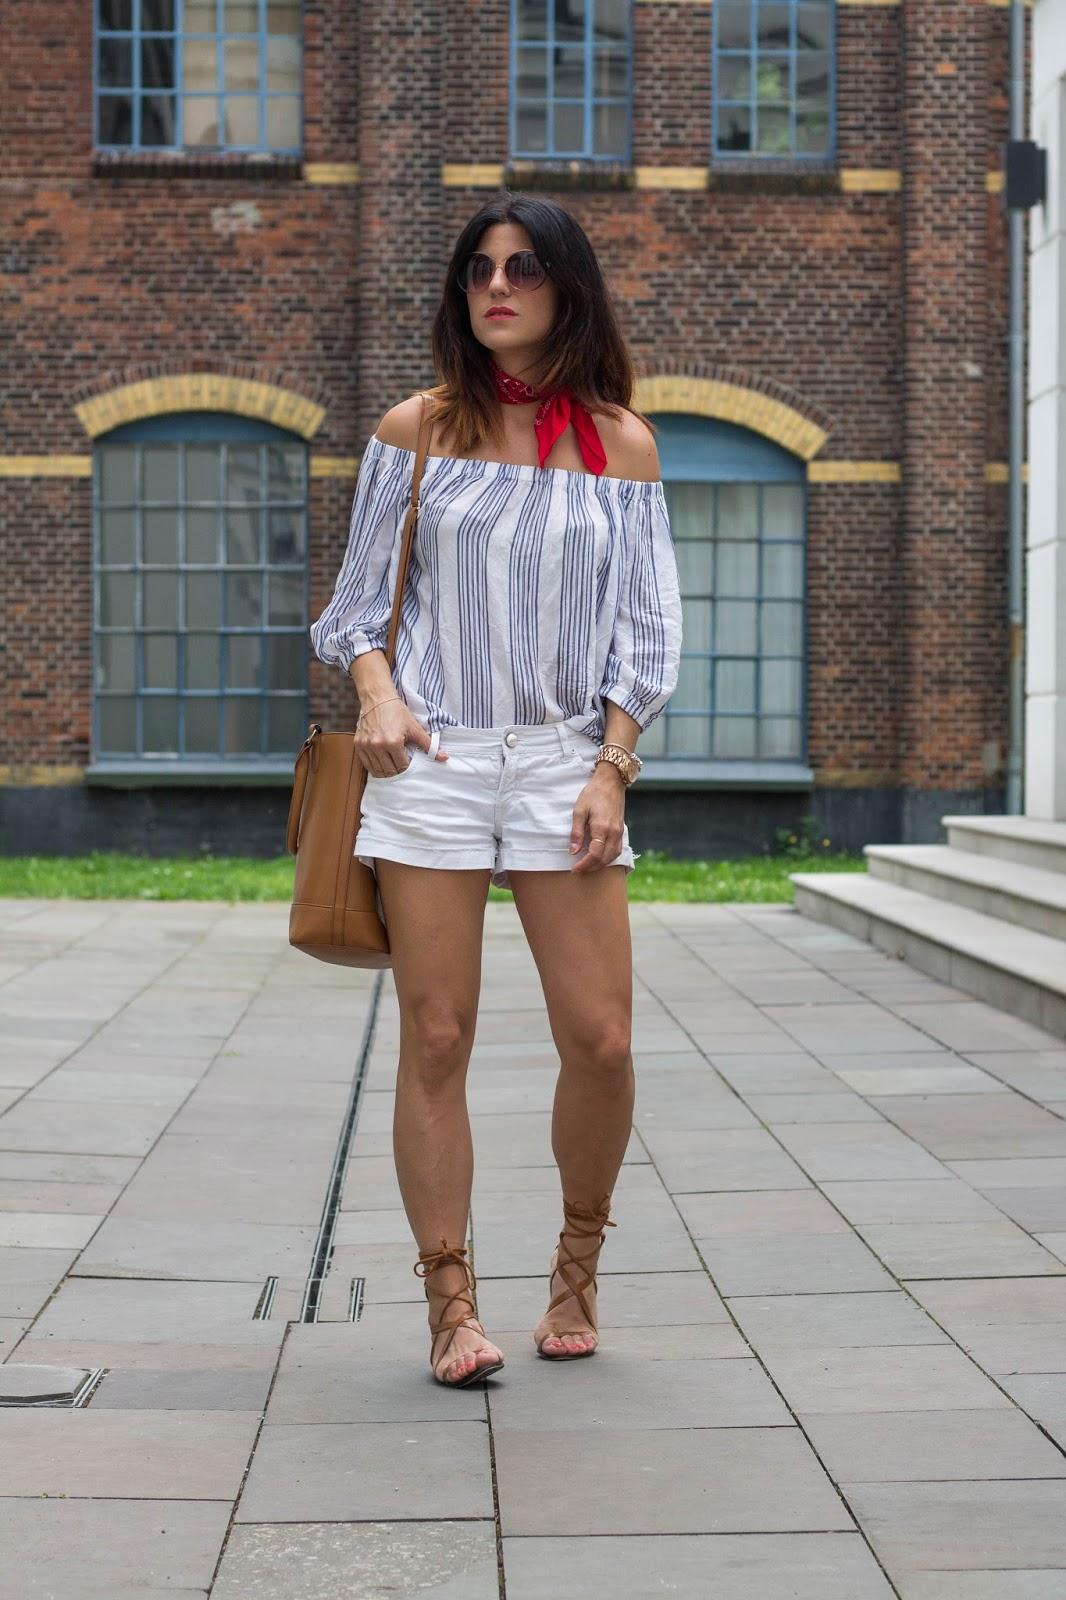 http://fashionavenueabc.blogspot.de/2016/08/red-bandana.html